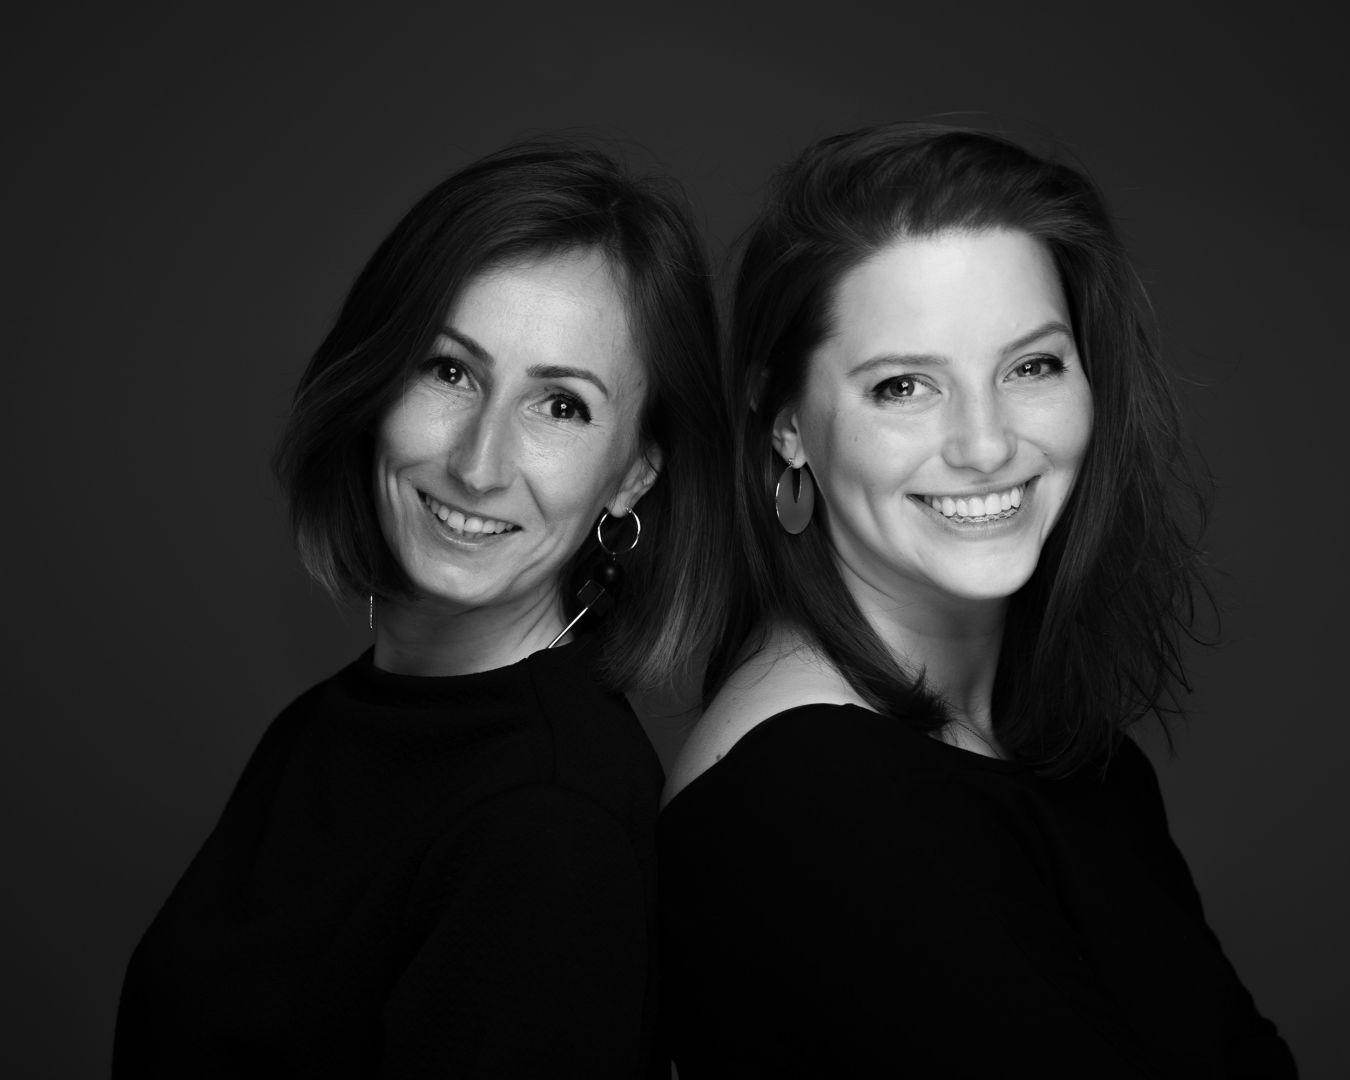 Agata Piltz i Zuzanna Pikiel, pracownia p2 Pikiel&Piltz